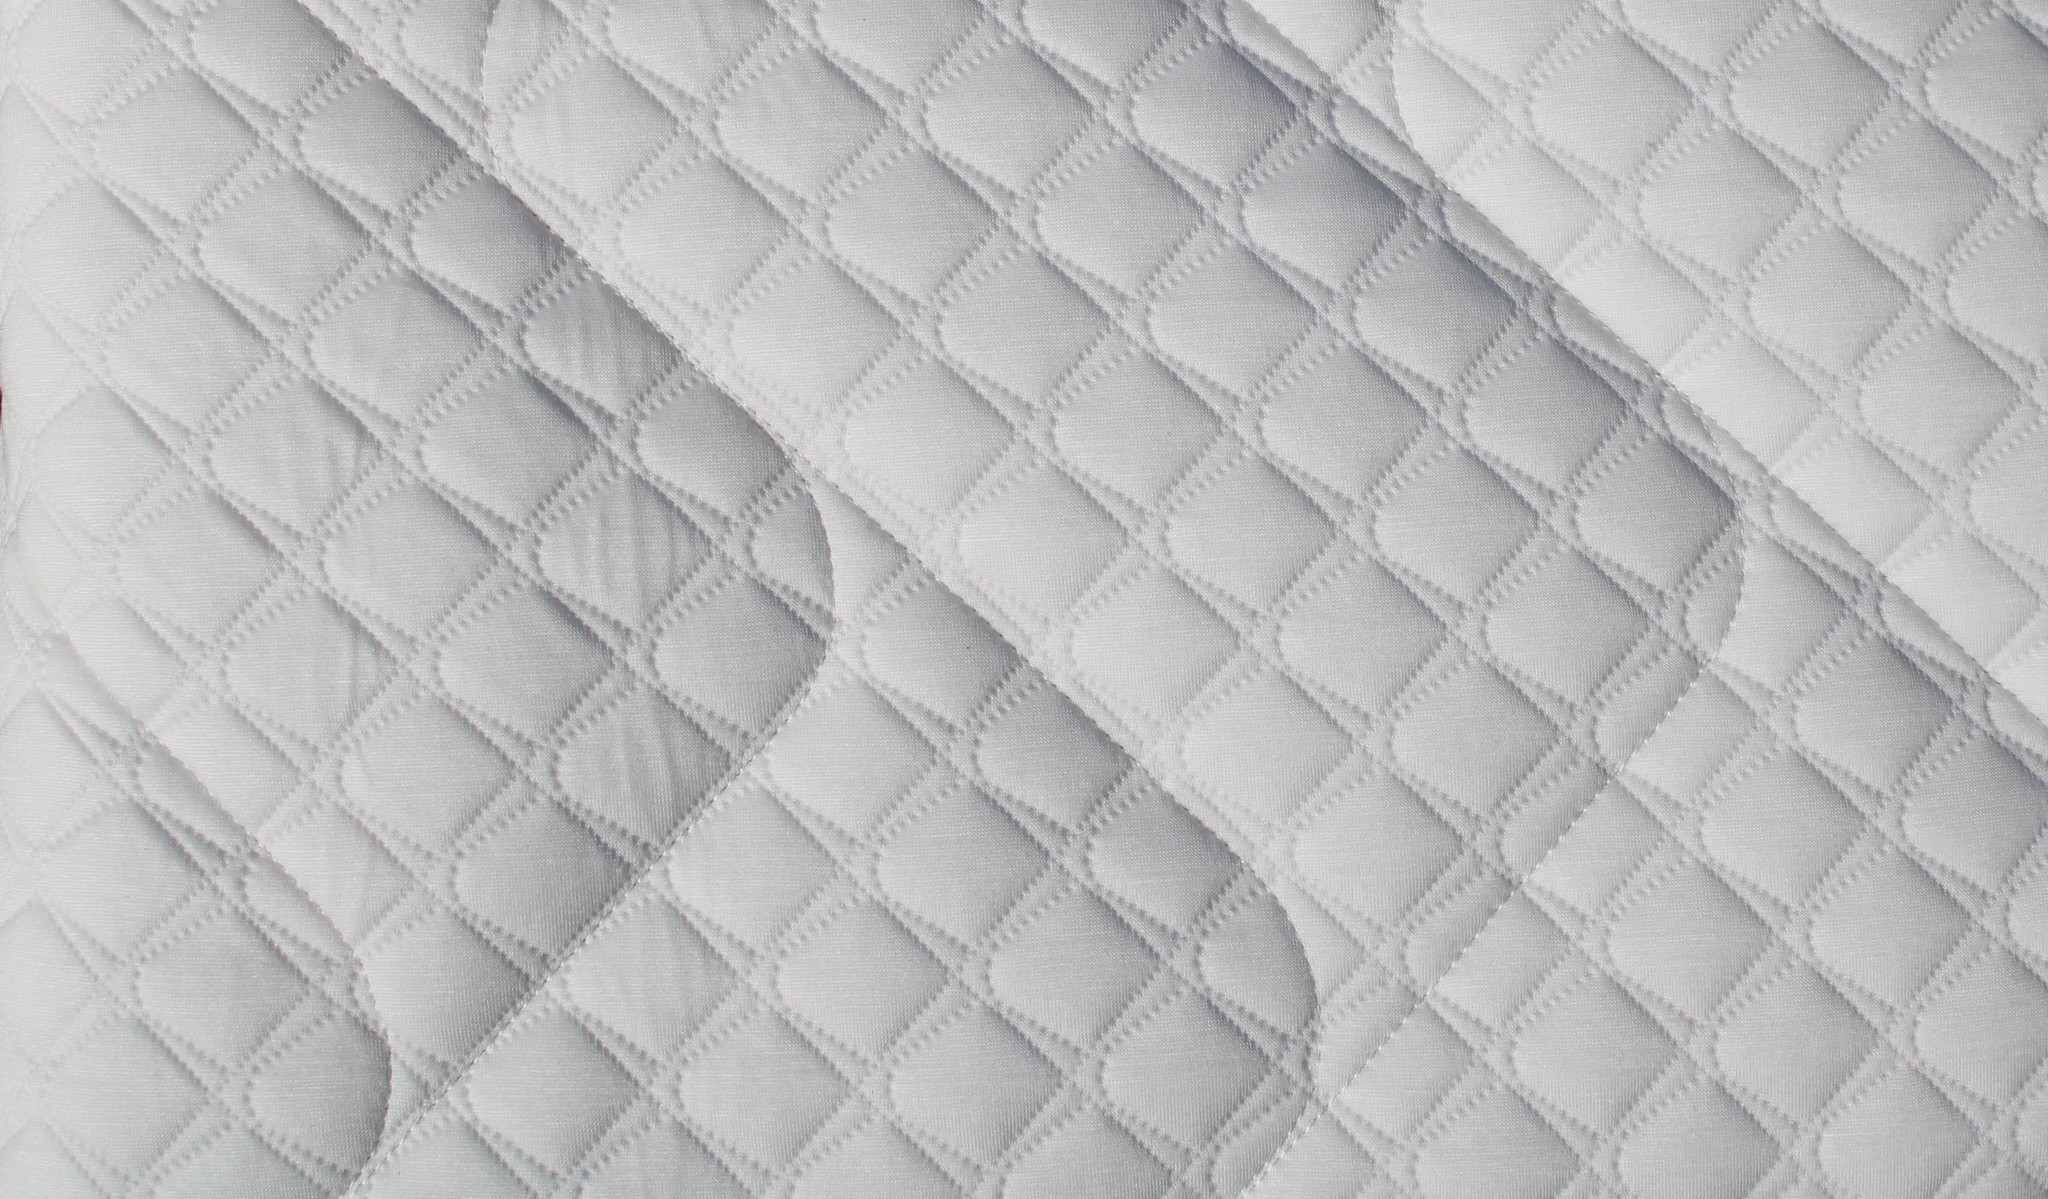 Sarpy Kindermatras 90x200 Sertel Tailor Made Mattress